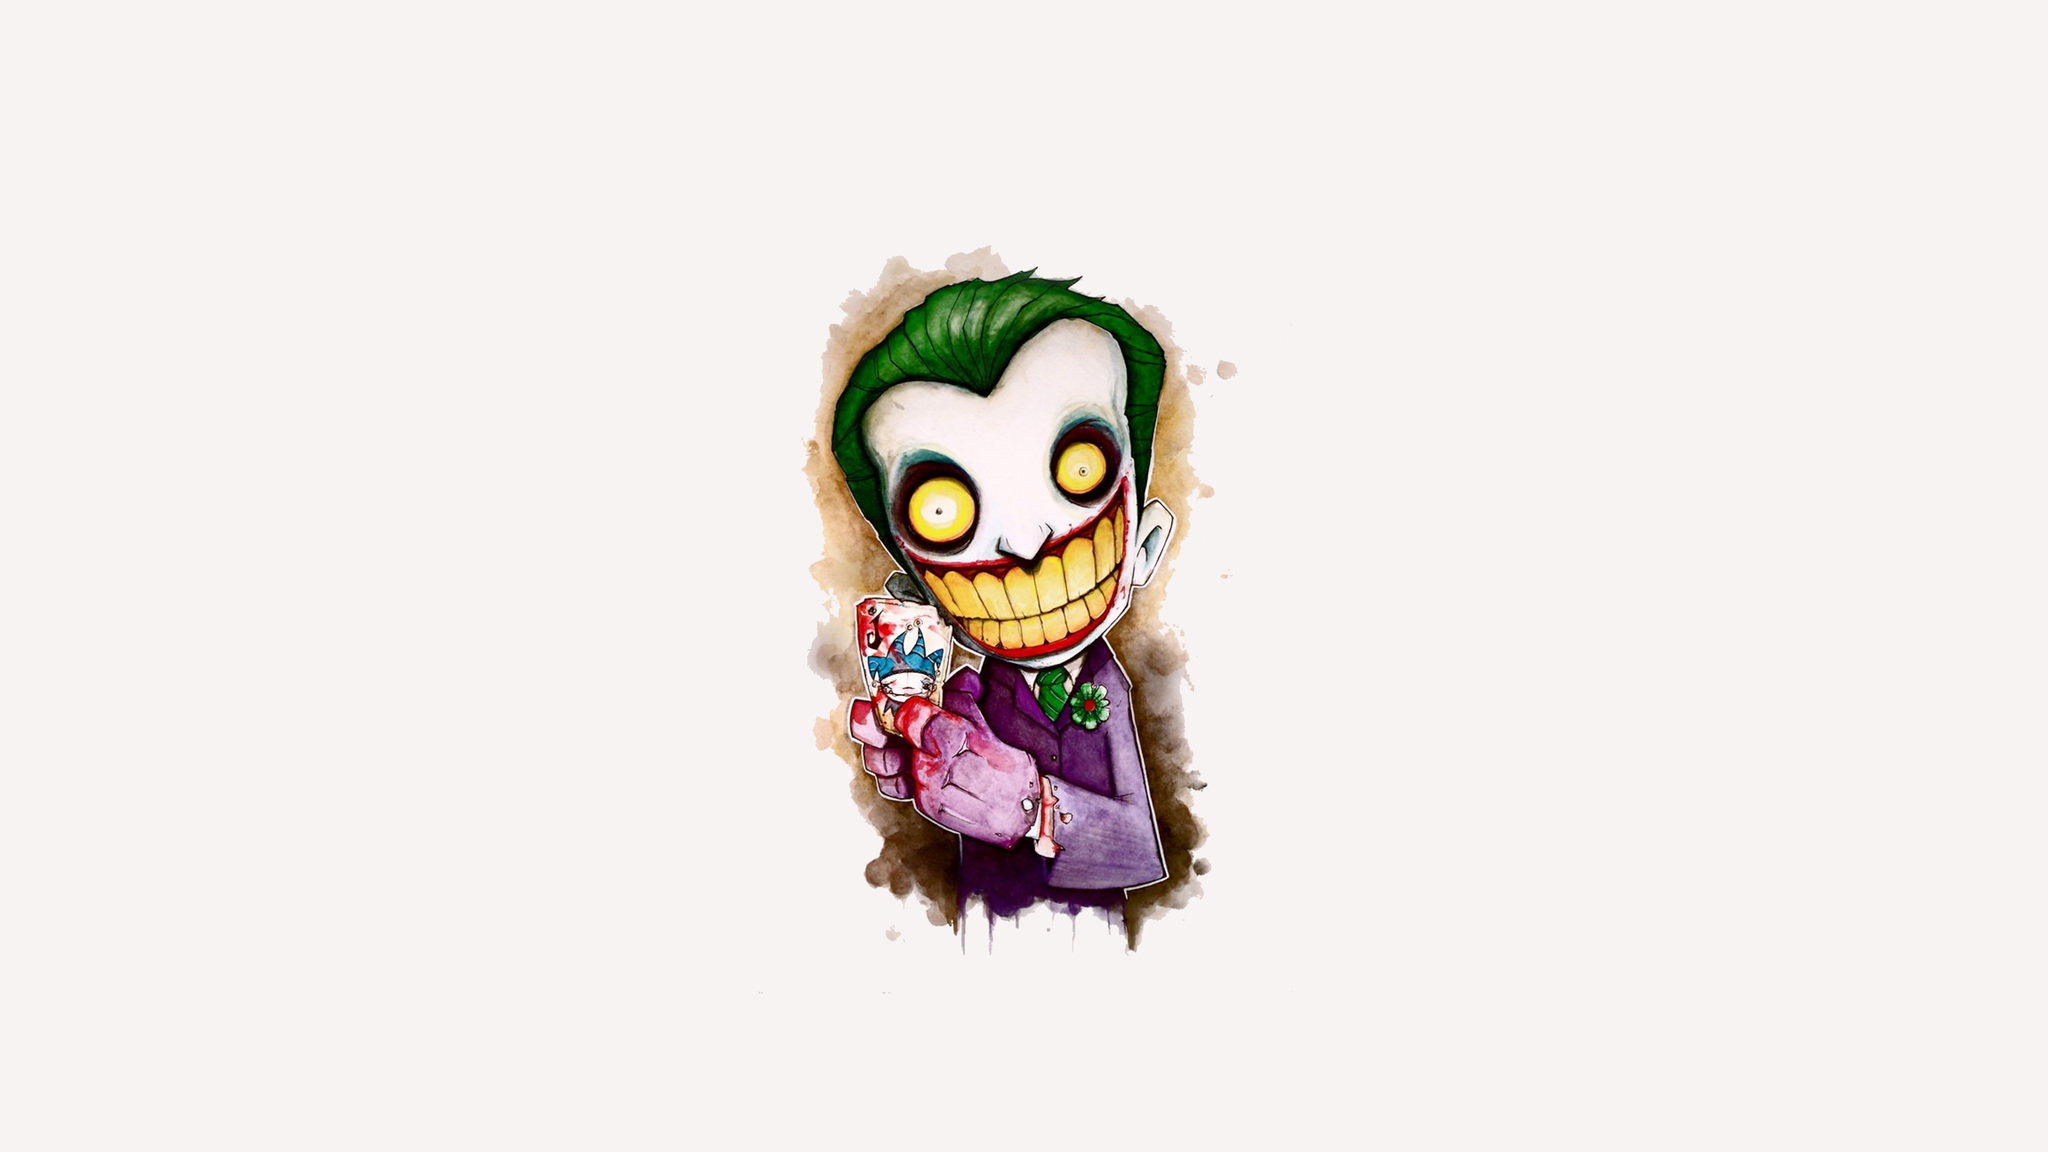 2048x1152 joker cartoon 4k artwork 2048x1152 resolution hd for Joker wallpaper 4k